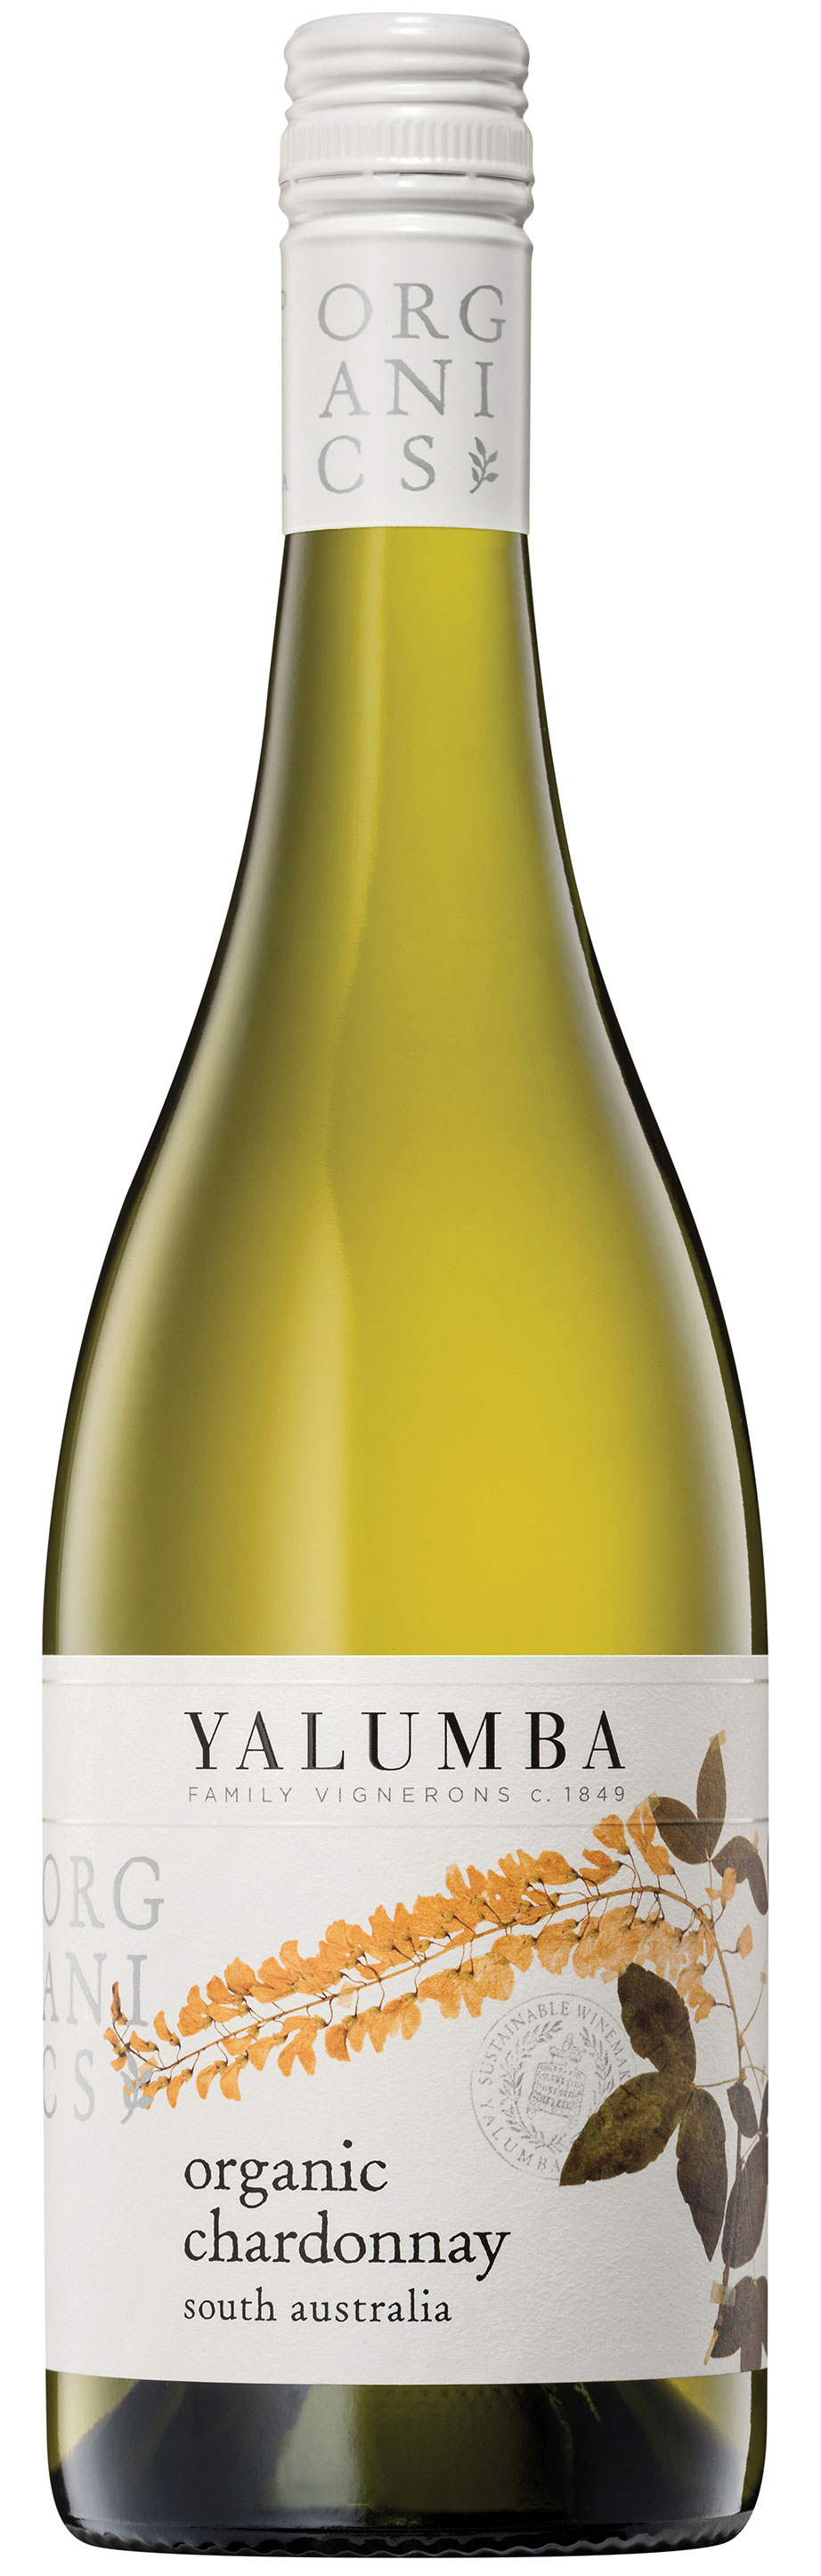 https://vinocorpperu.com/images/vinos/yalumba/organic_chardonnay_2016.jpg